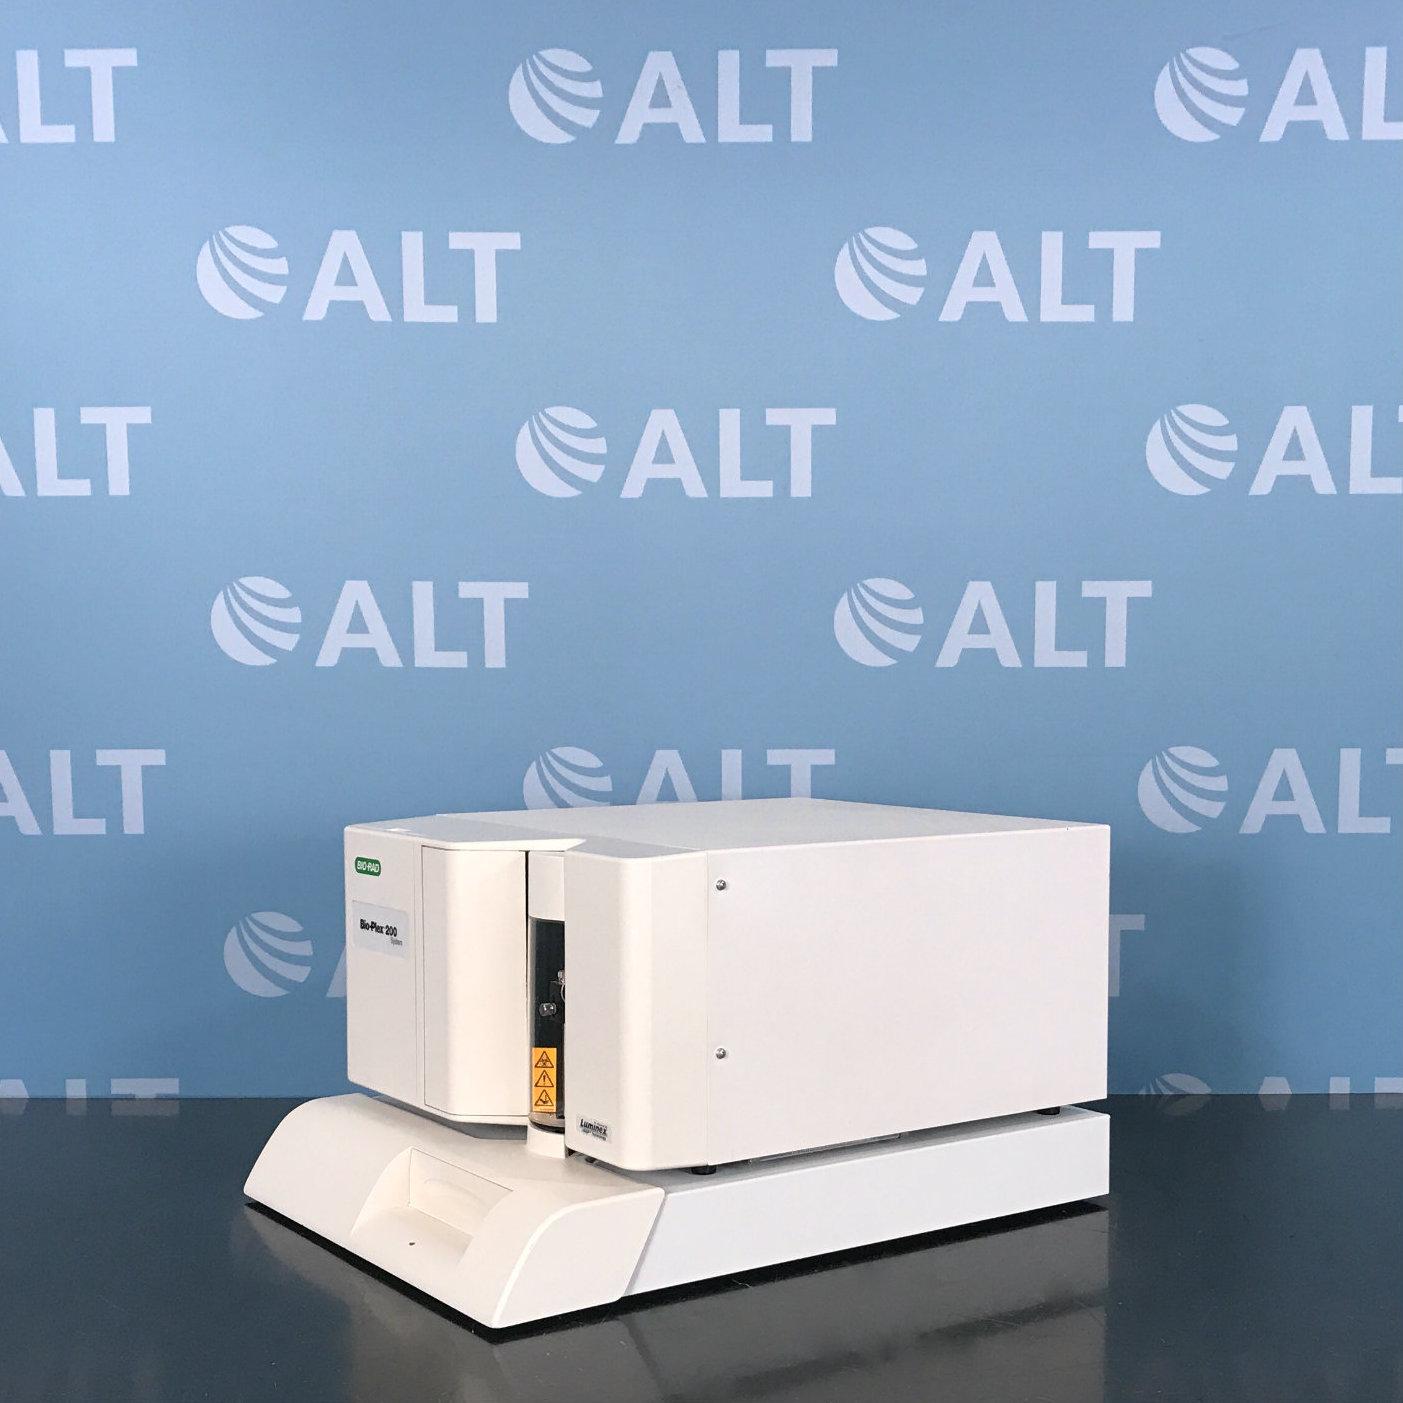 Bio-Rad Bio-Plex 200 System with HTF Image